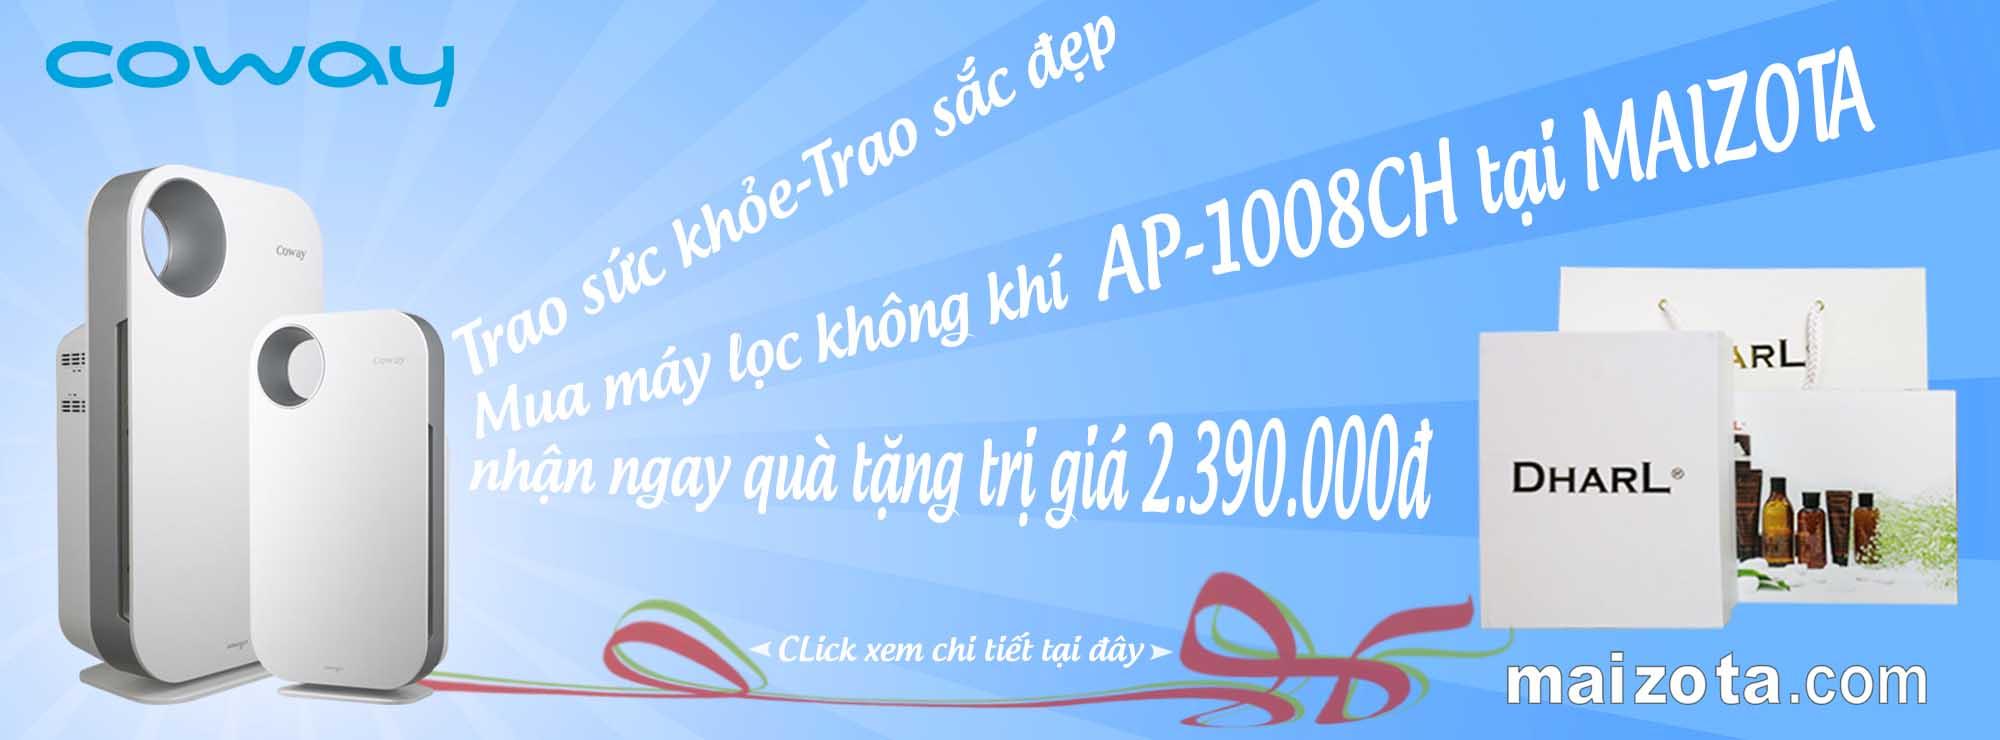 chuong-trinh-khuyen-mai-cuc-soc-coway